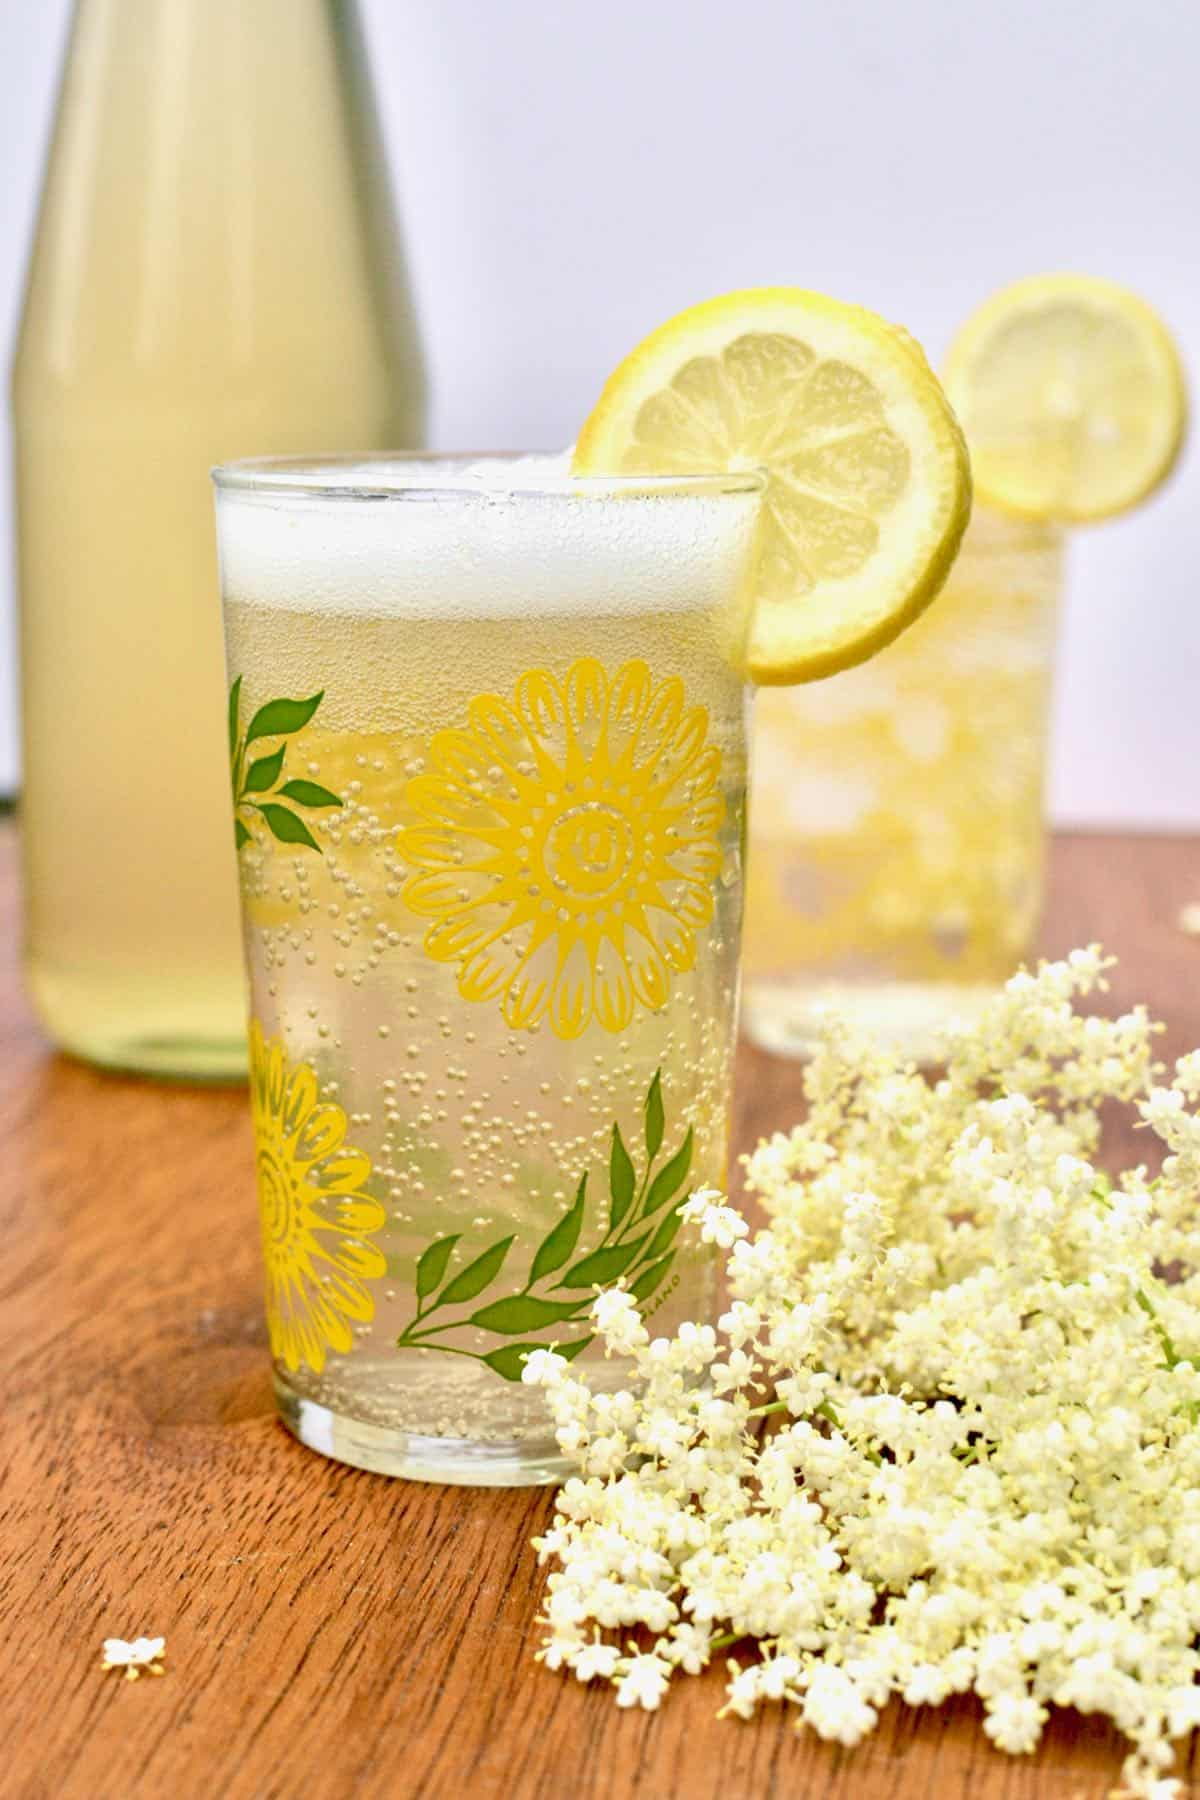 A bubbling glass of sparkling elderflower pressé